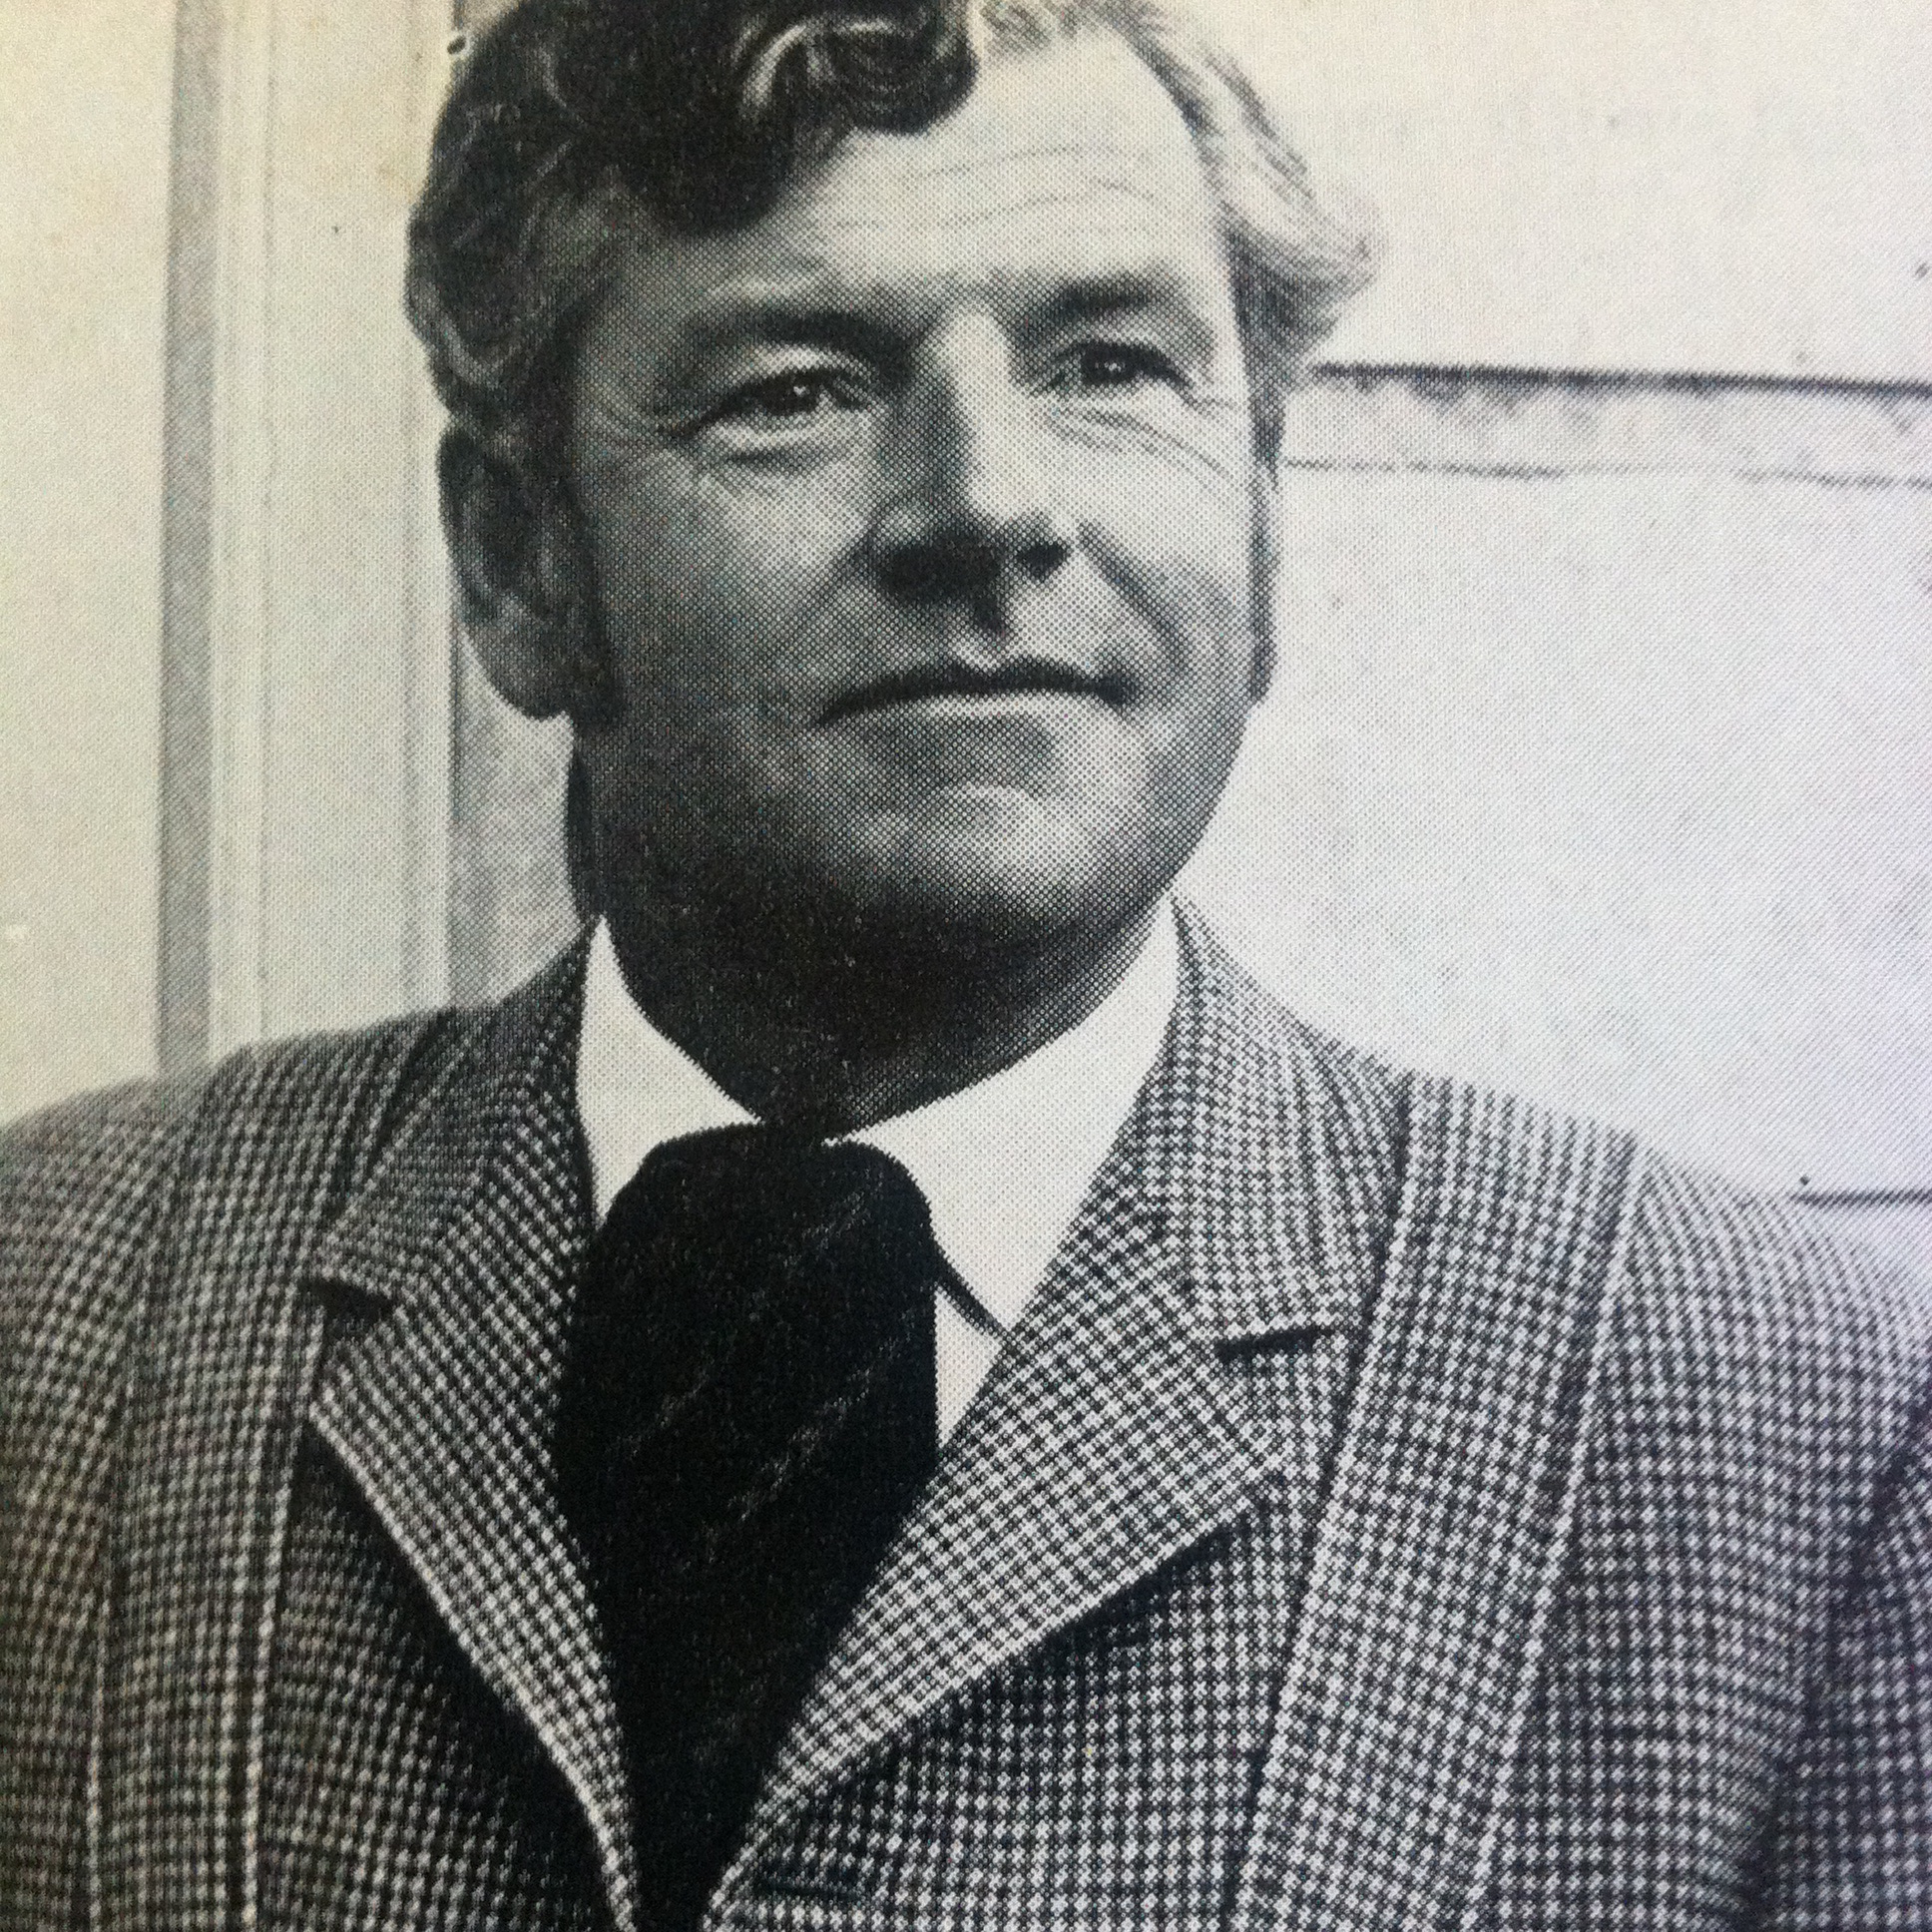 Kenneth More in The Forsyte Saga (1967)